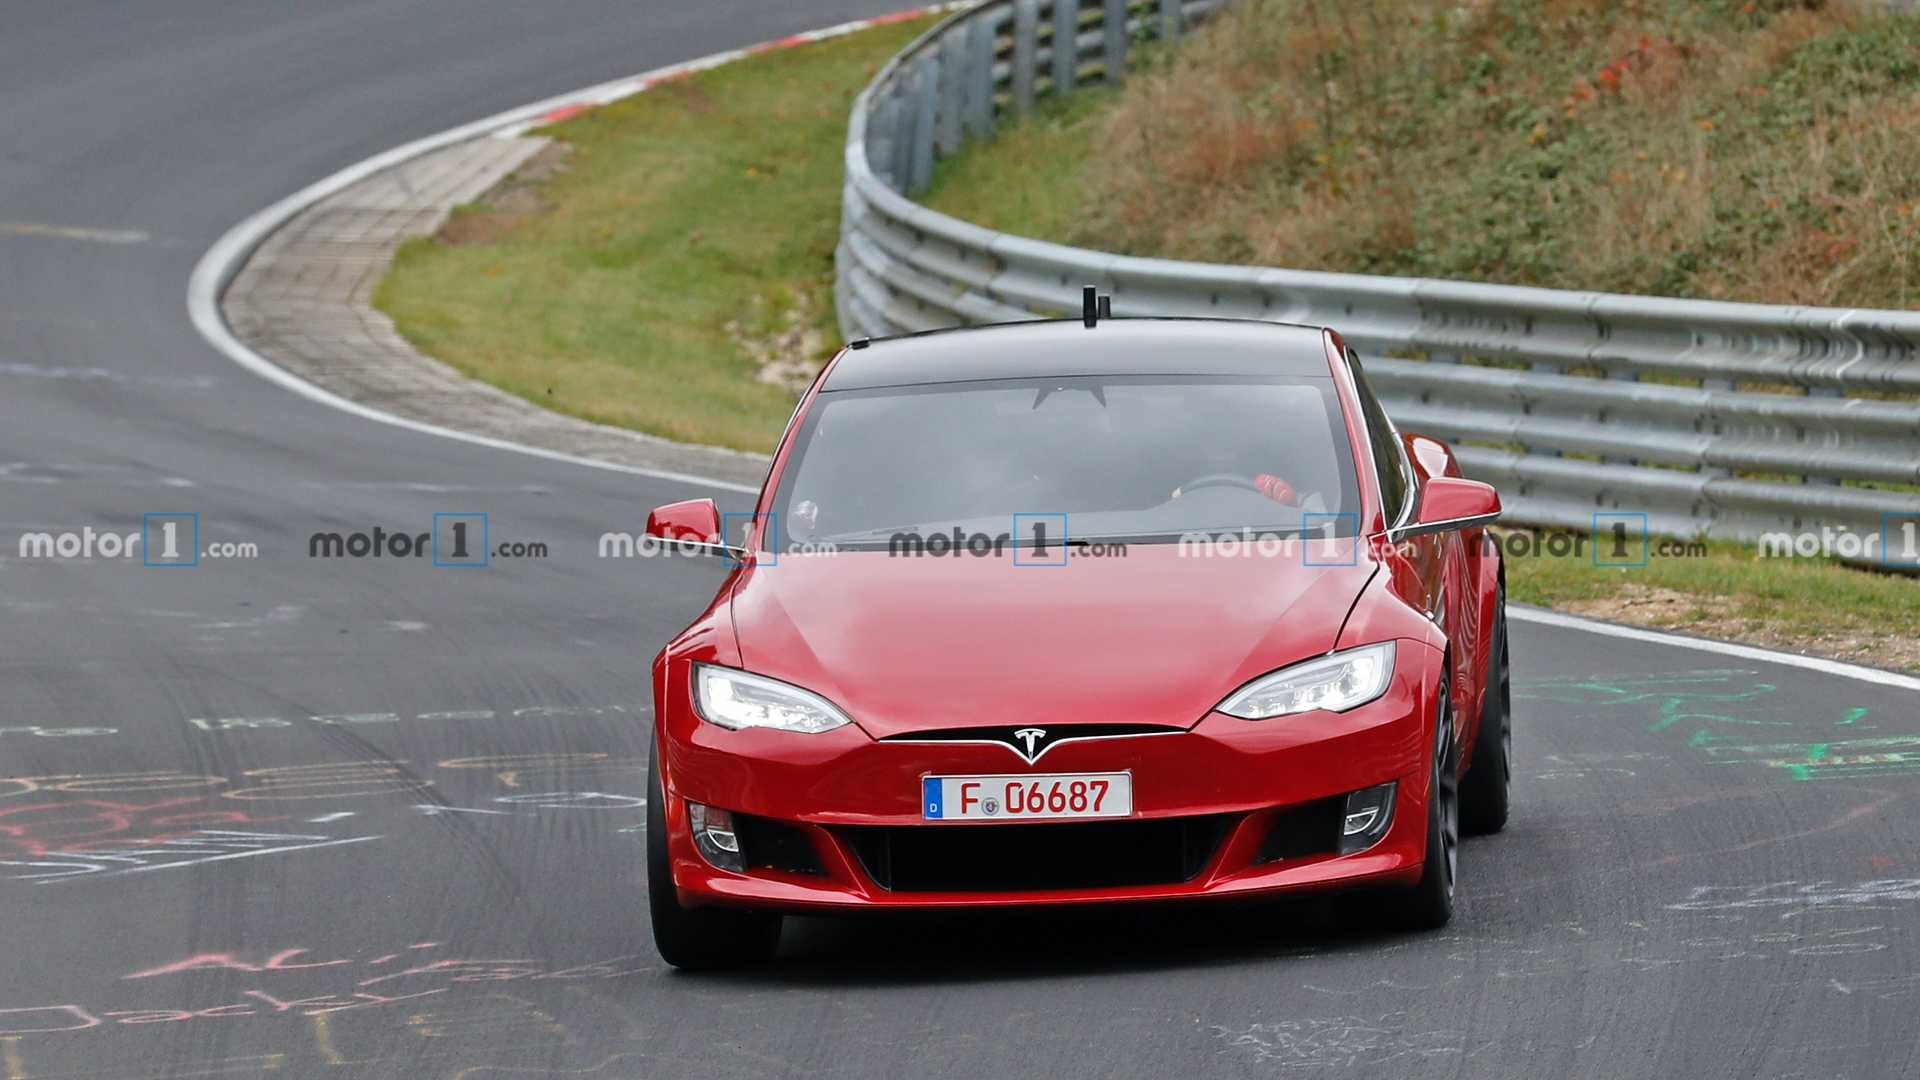 Tesla Model S Spied At Nurburgring